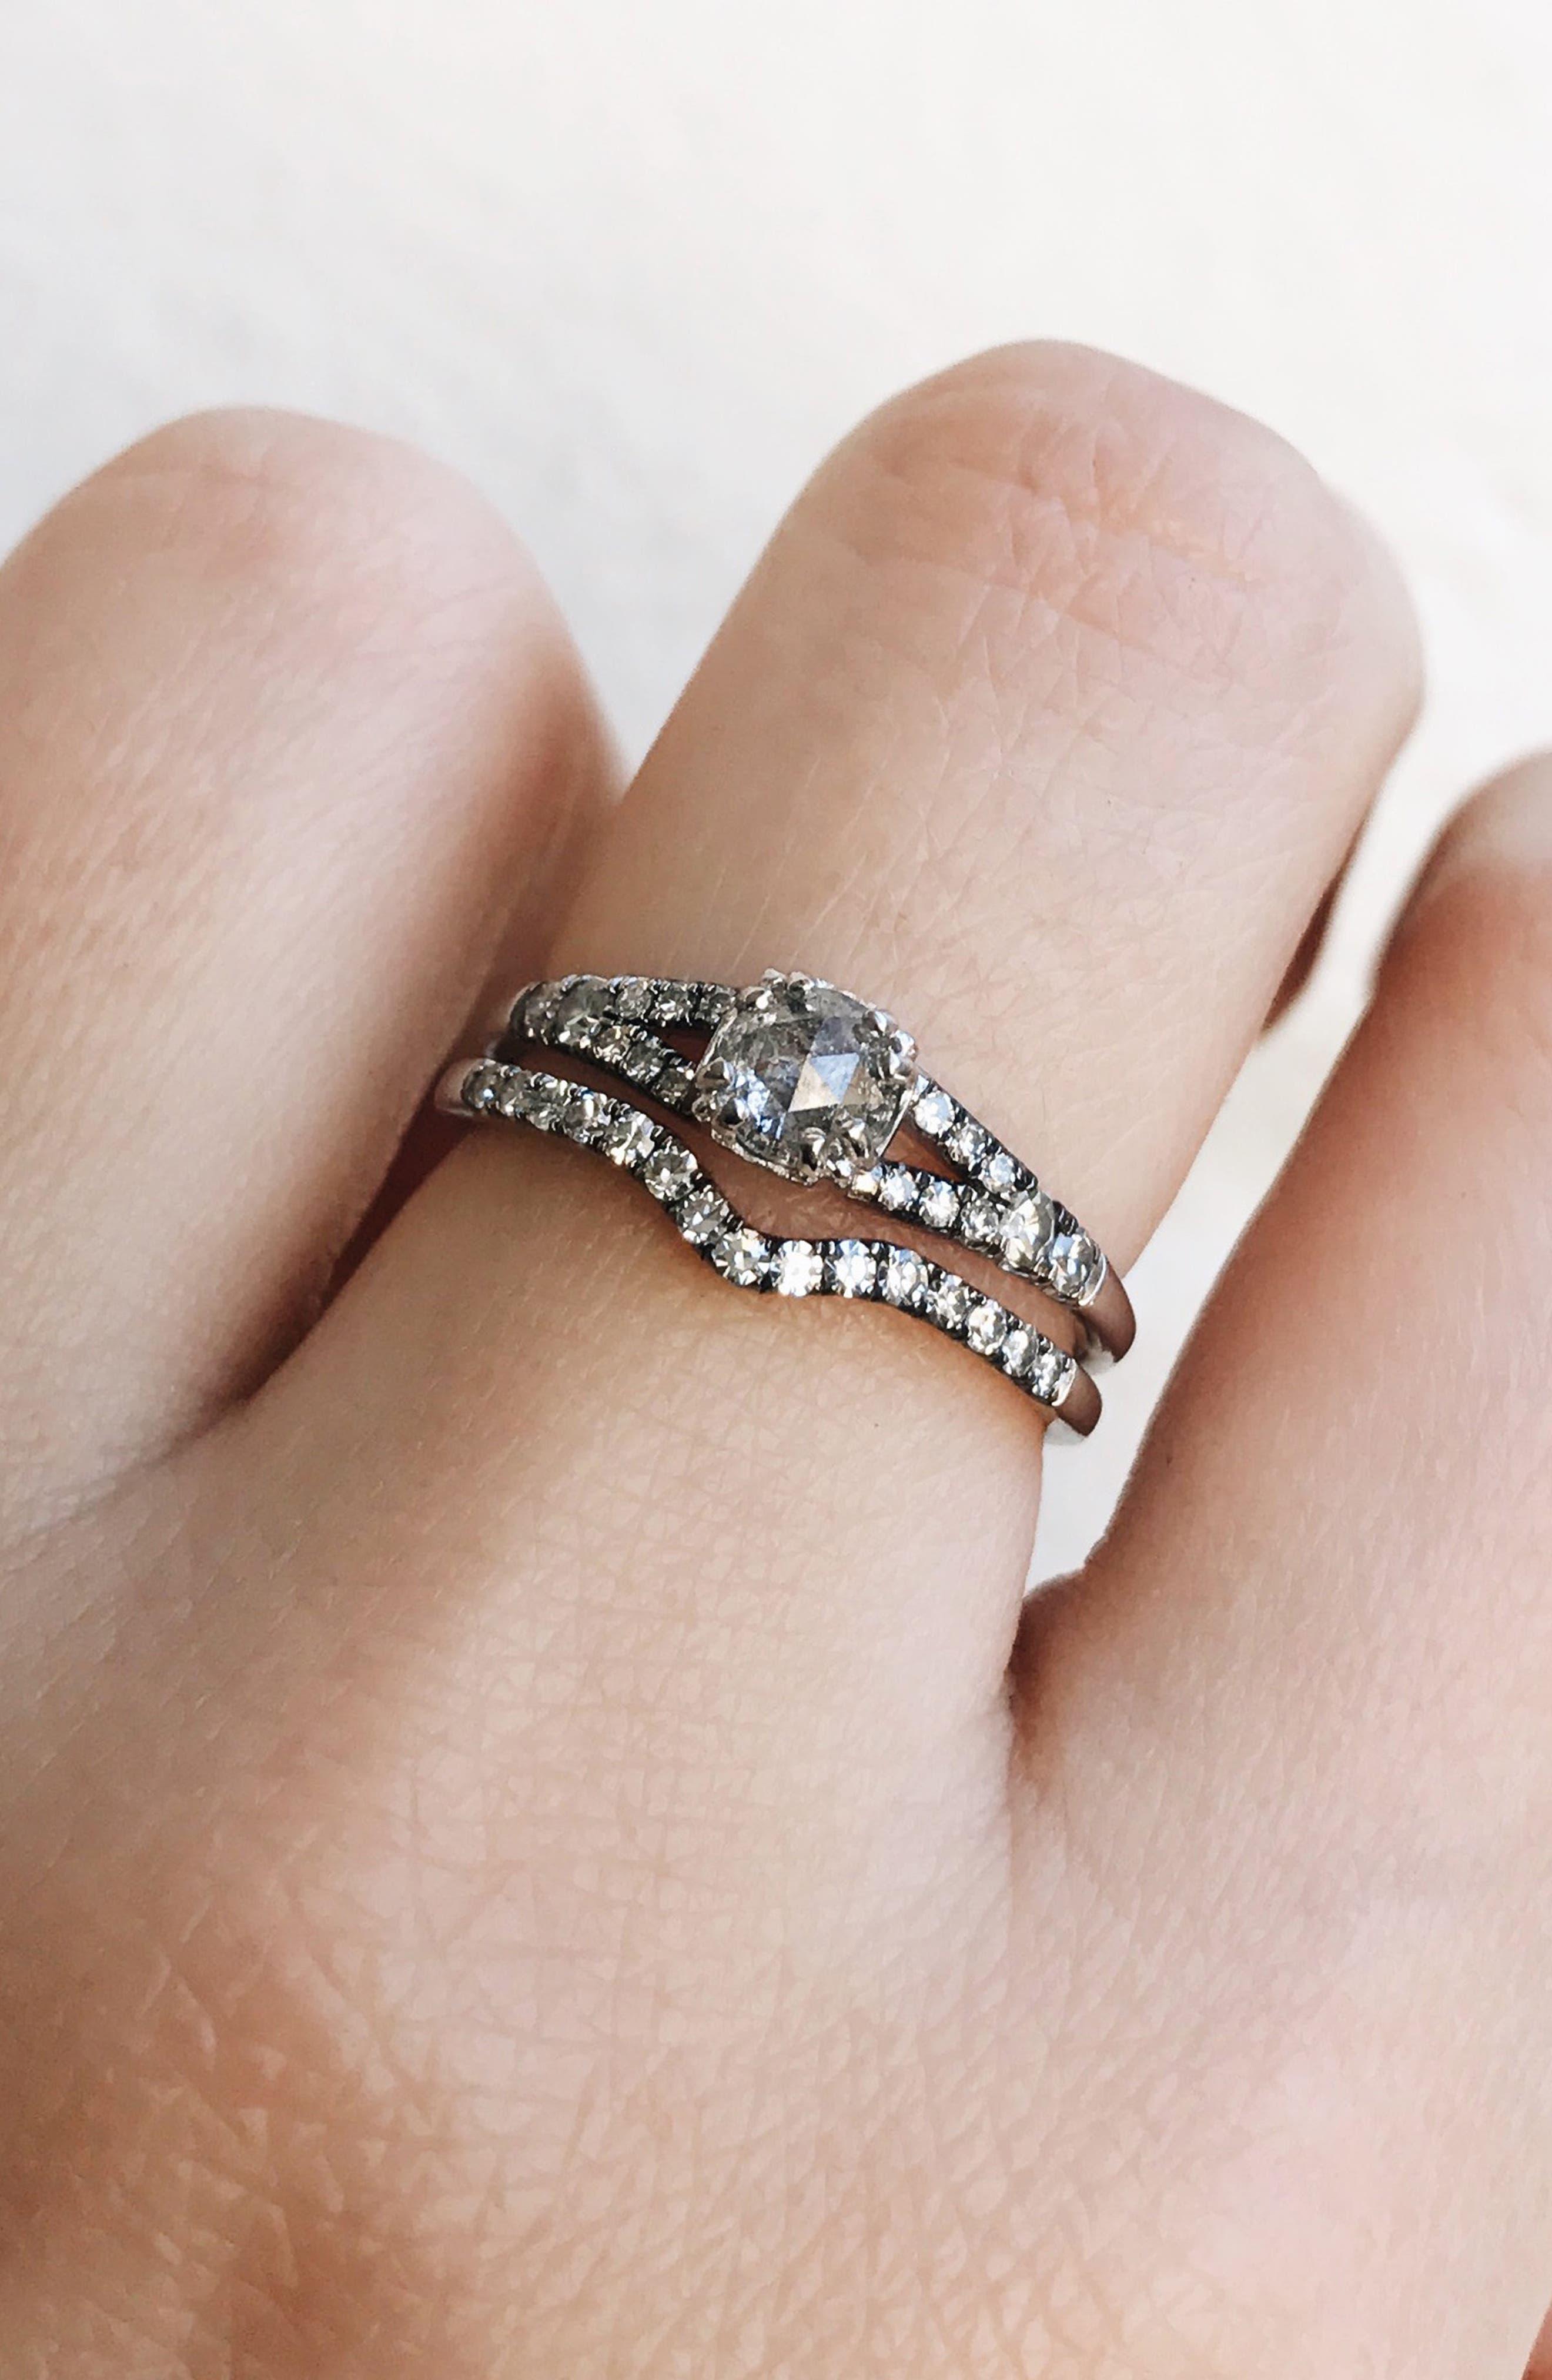 Alternate Image 2  - Maniamania Devotion Solitaire Diamond Ring